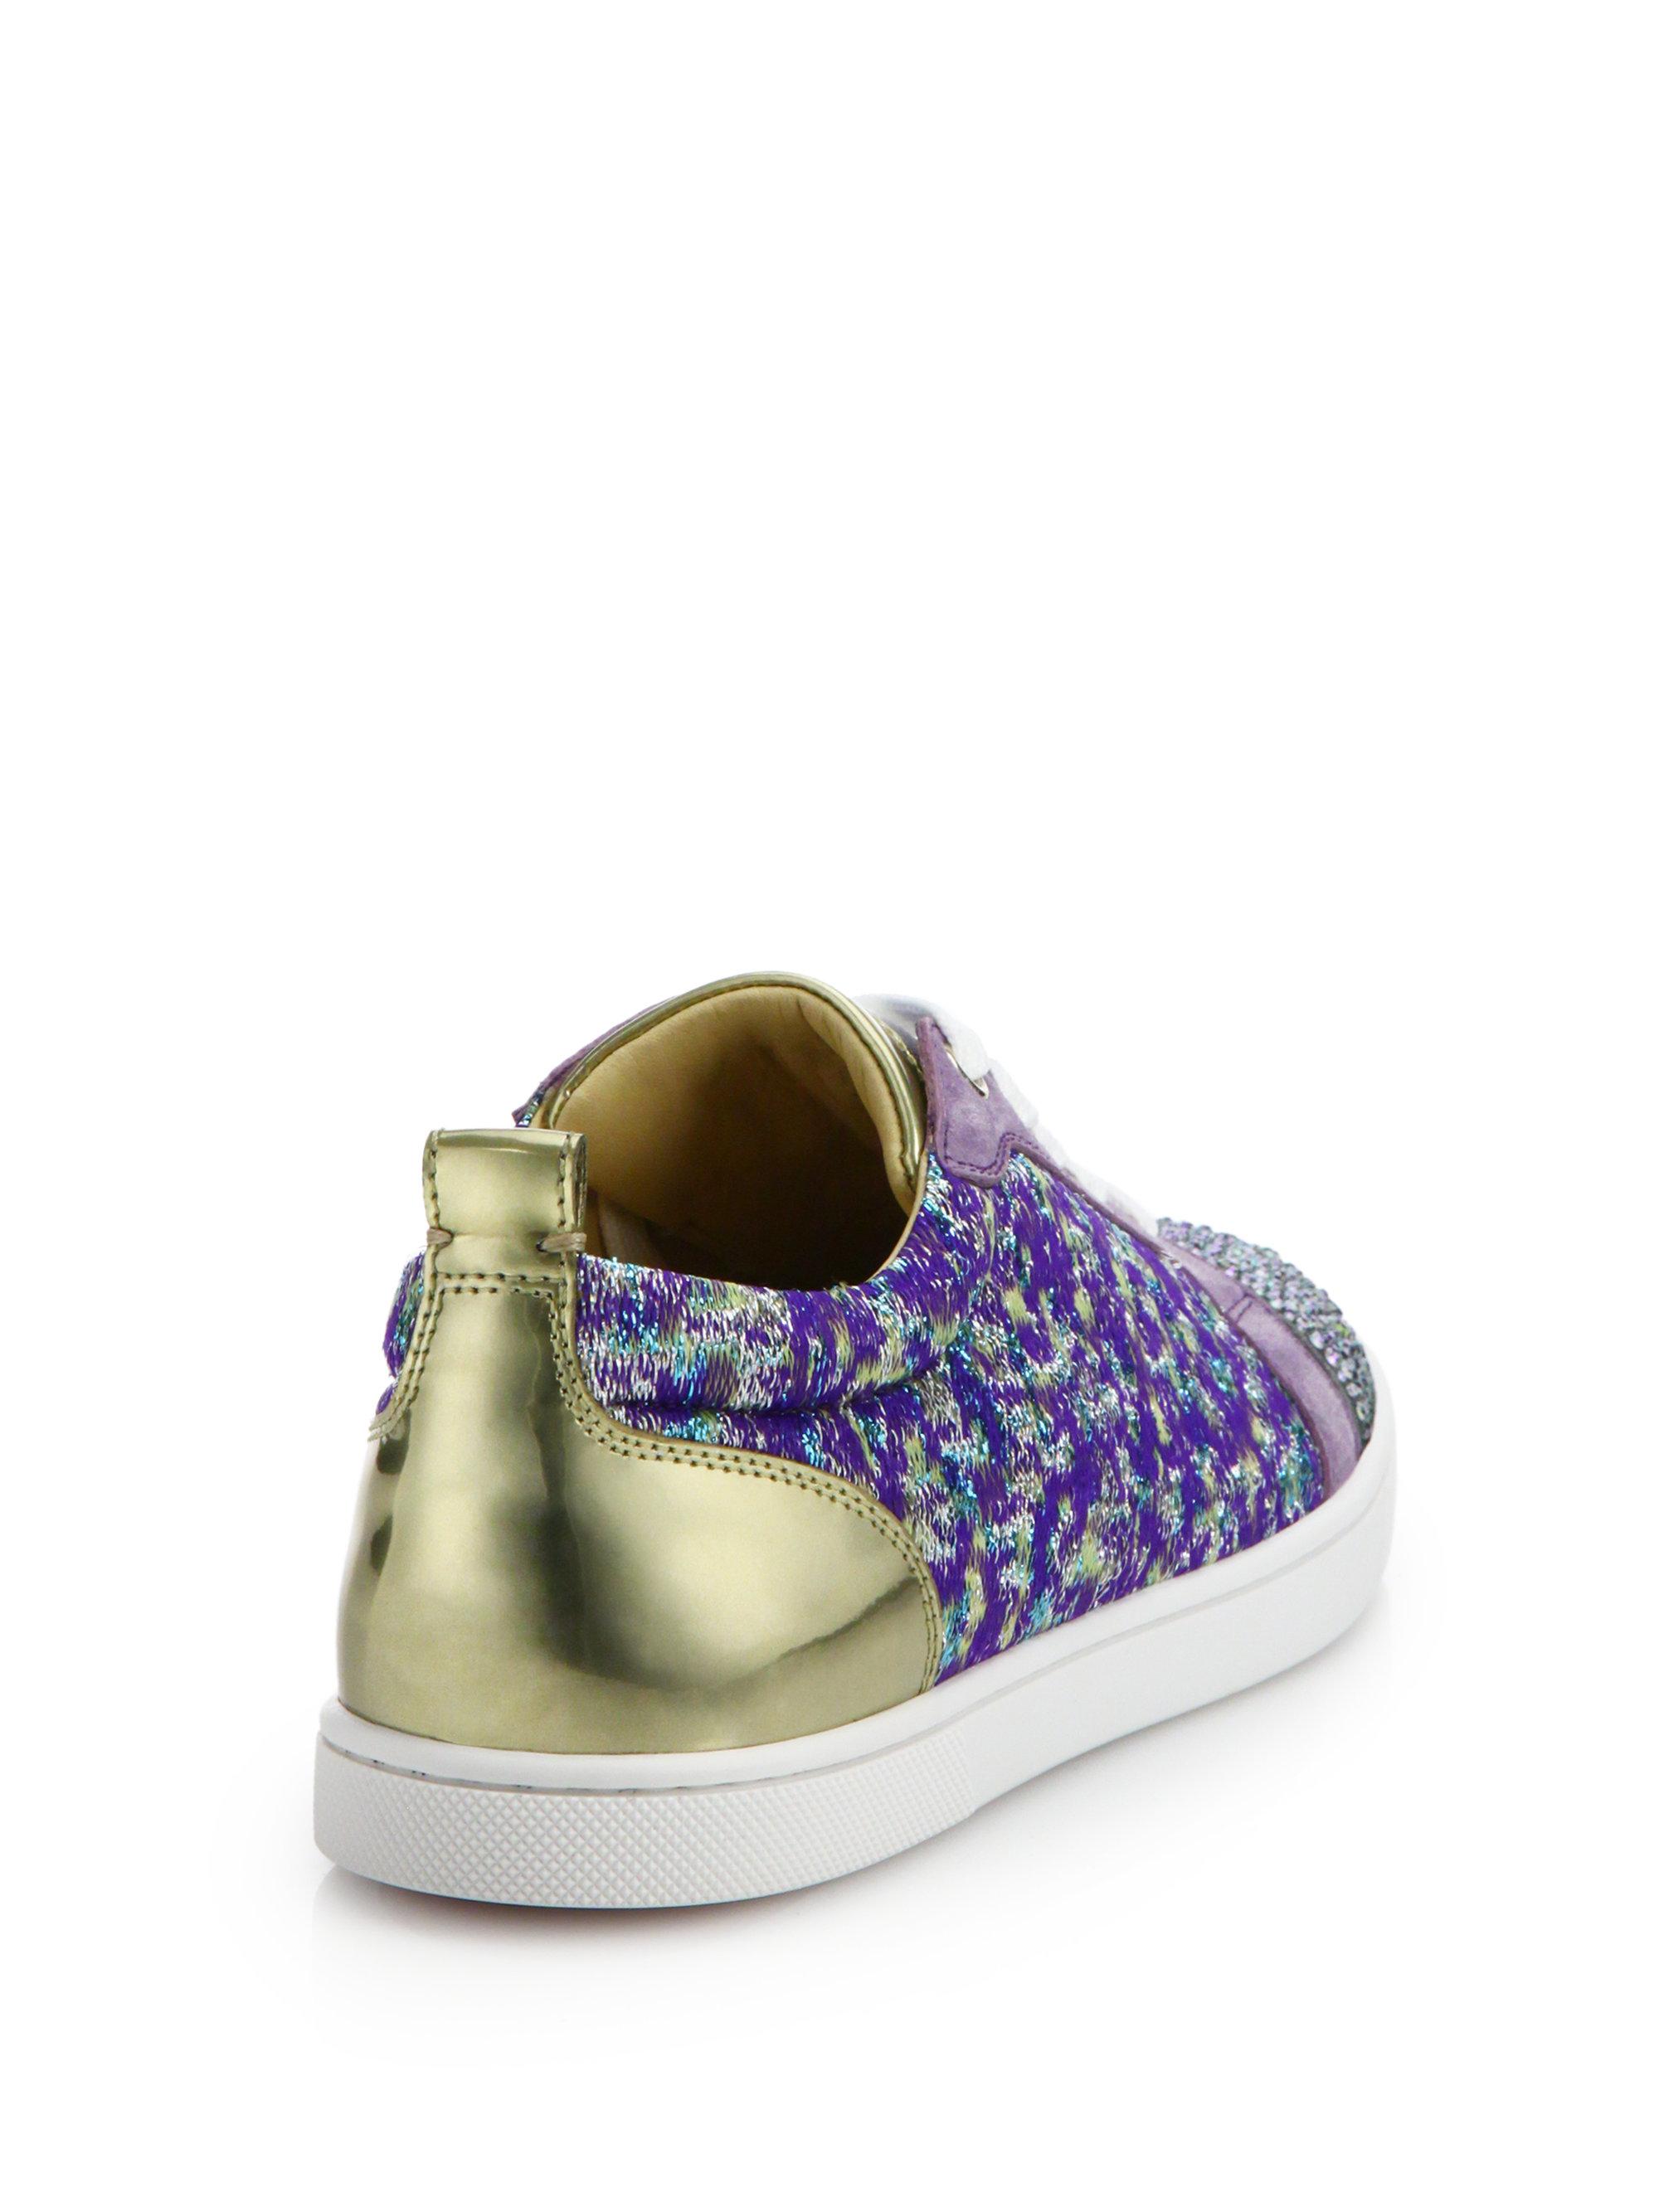 Christian louboutin Gondolastrass Low-top Sneakers in Purple ...